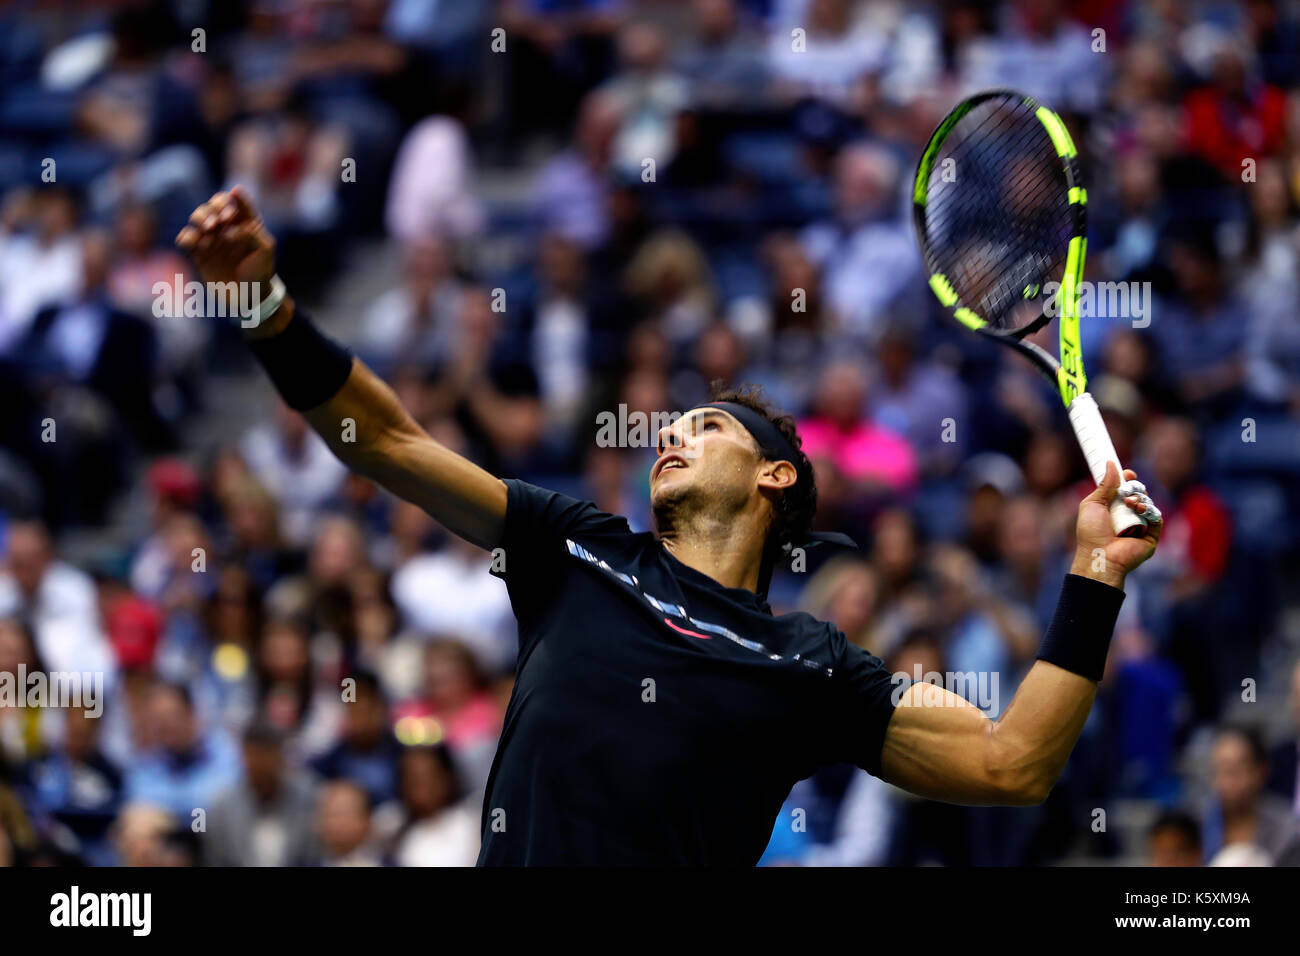 New York, United States. 10th Sep, 2017. US Open Tennis: New York, 10 September, 2017 - Rafael Nadal of Spain serving - Stock Image